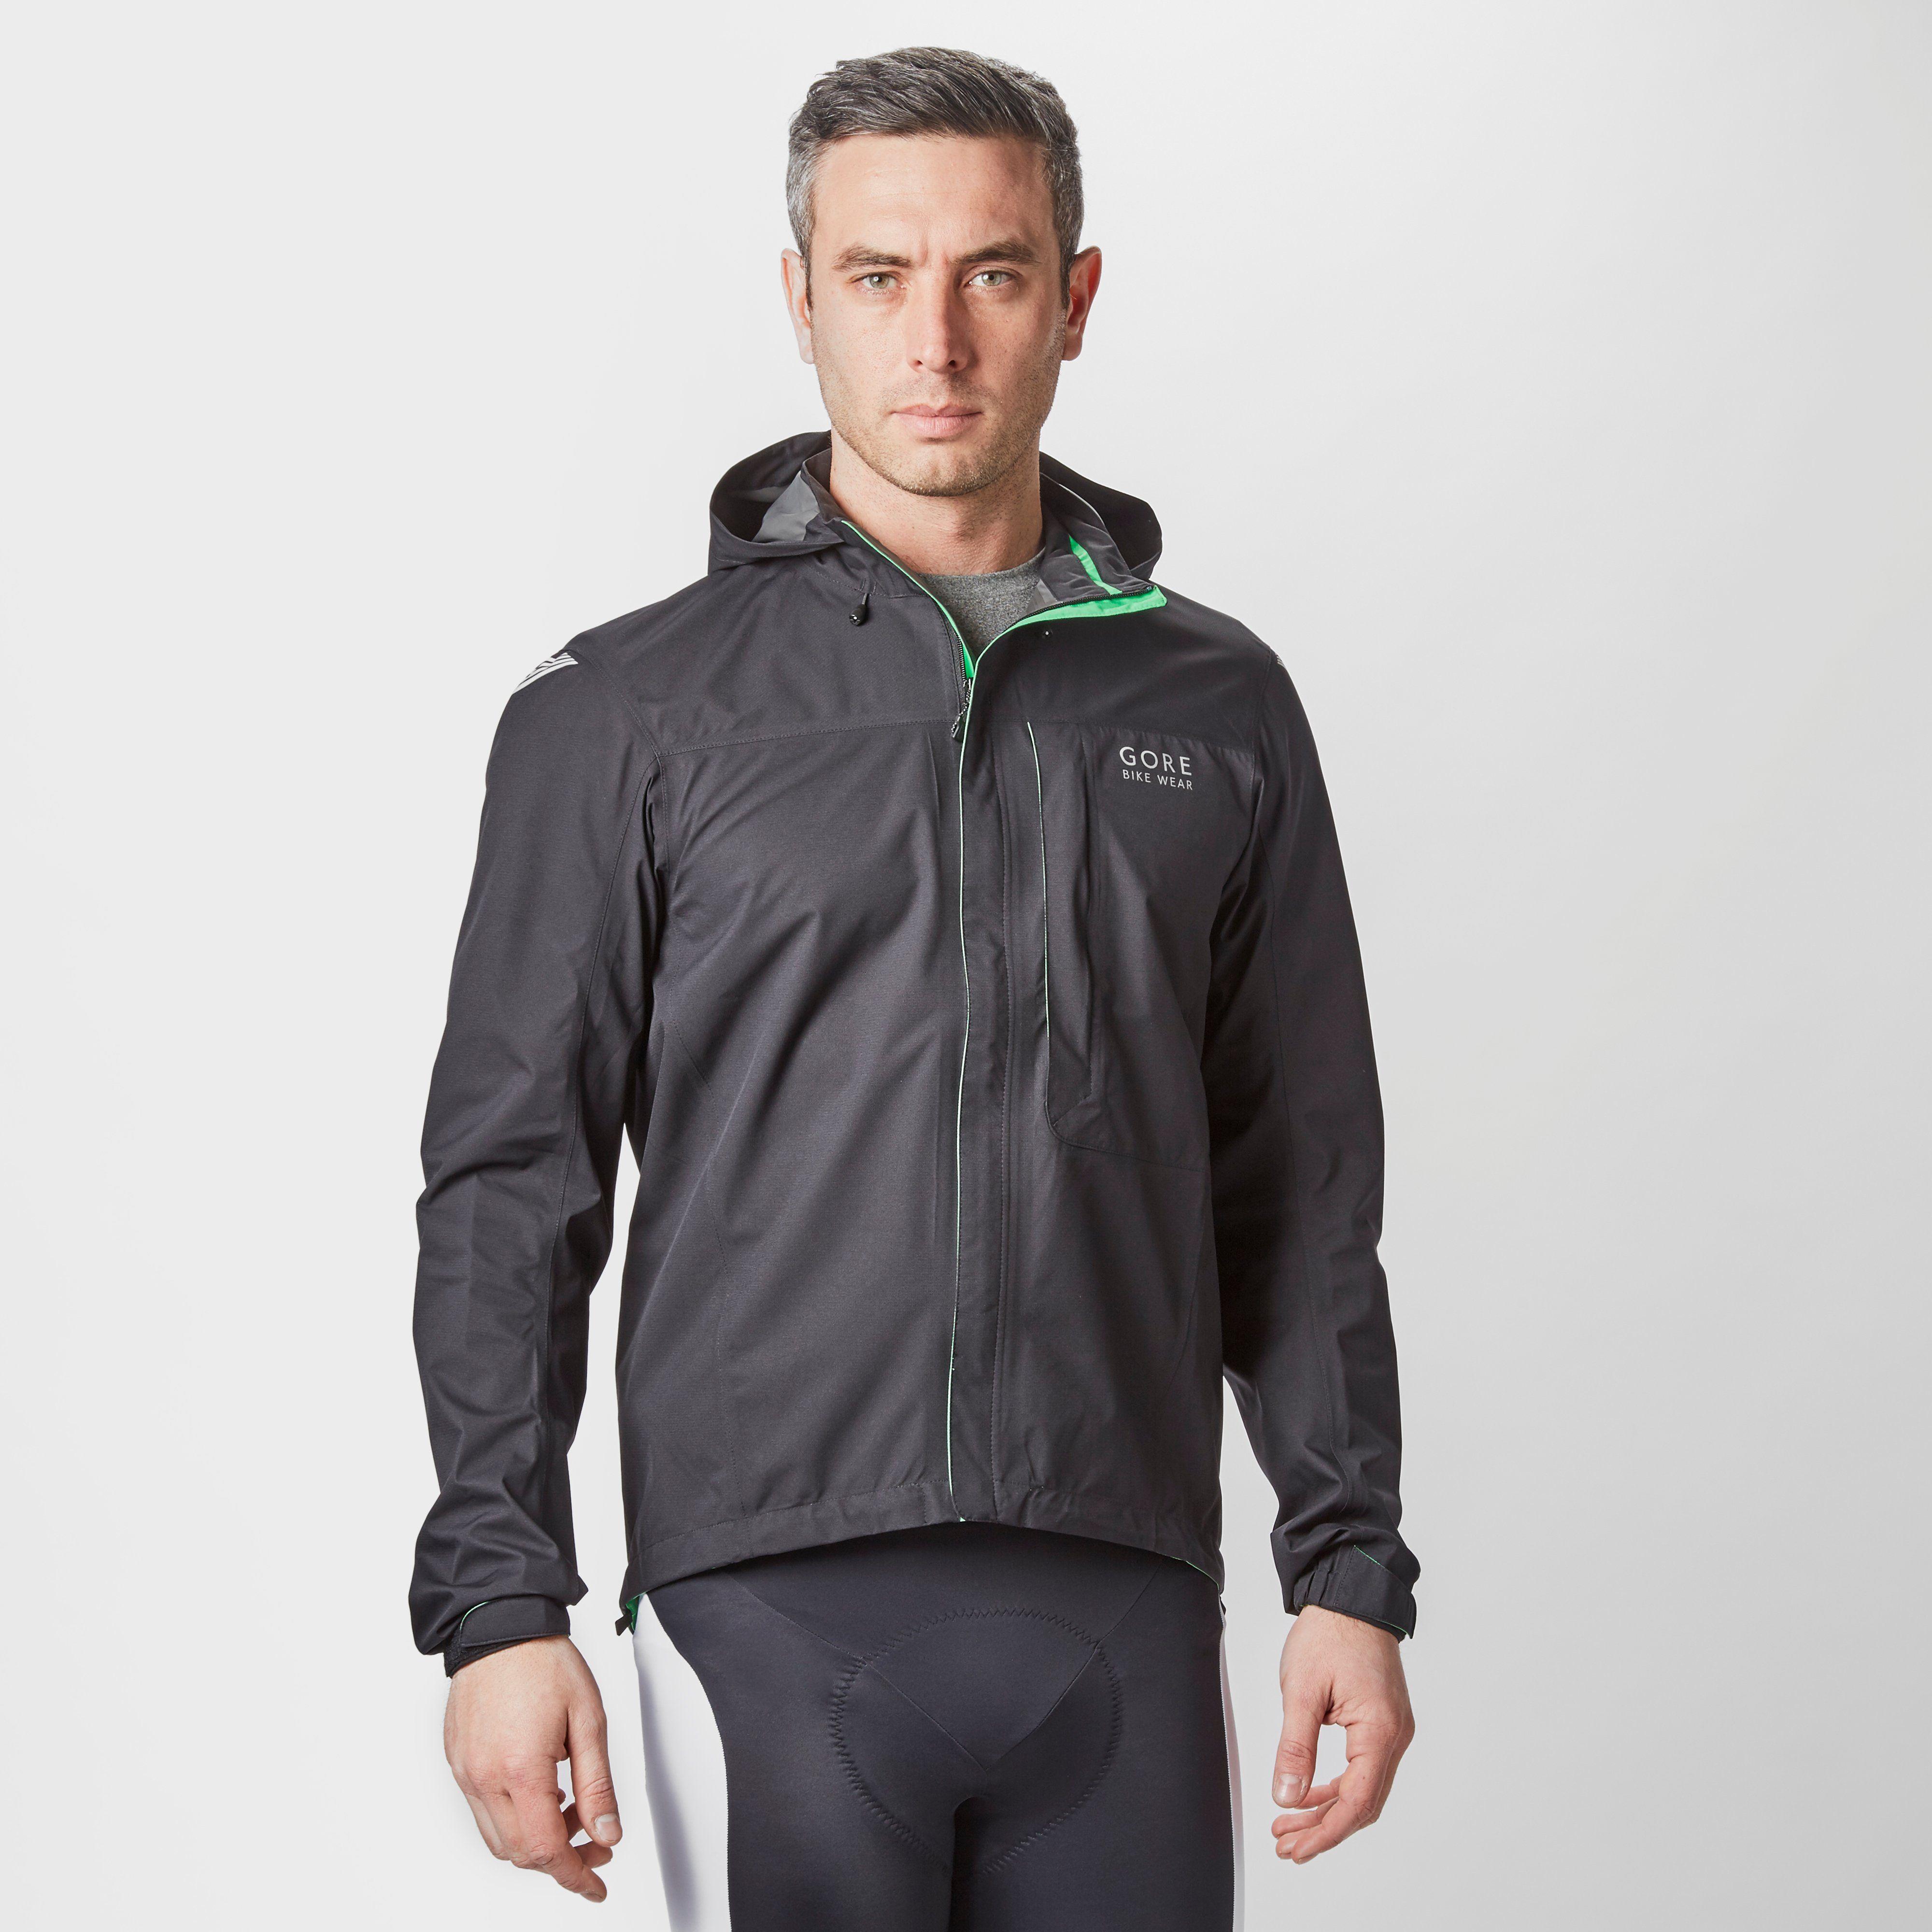 GORE Men's Element Paclite Gore-Tex® Cycling Jacket